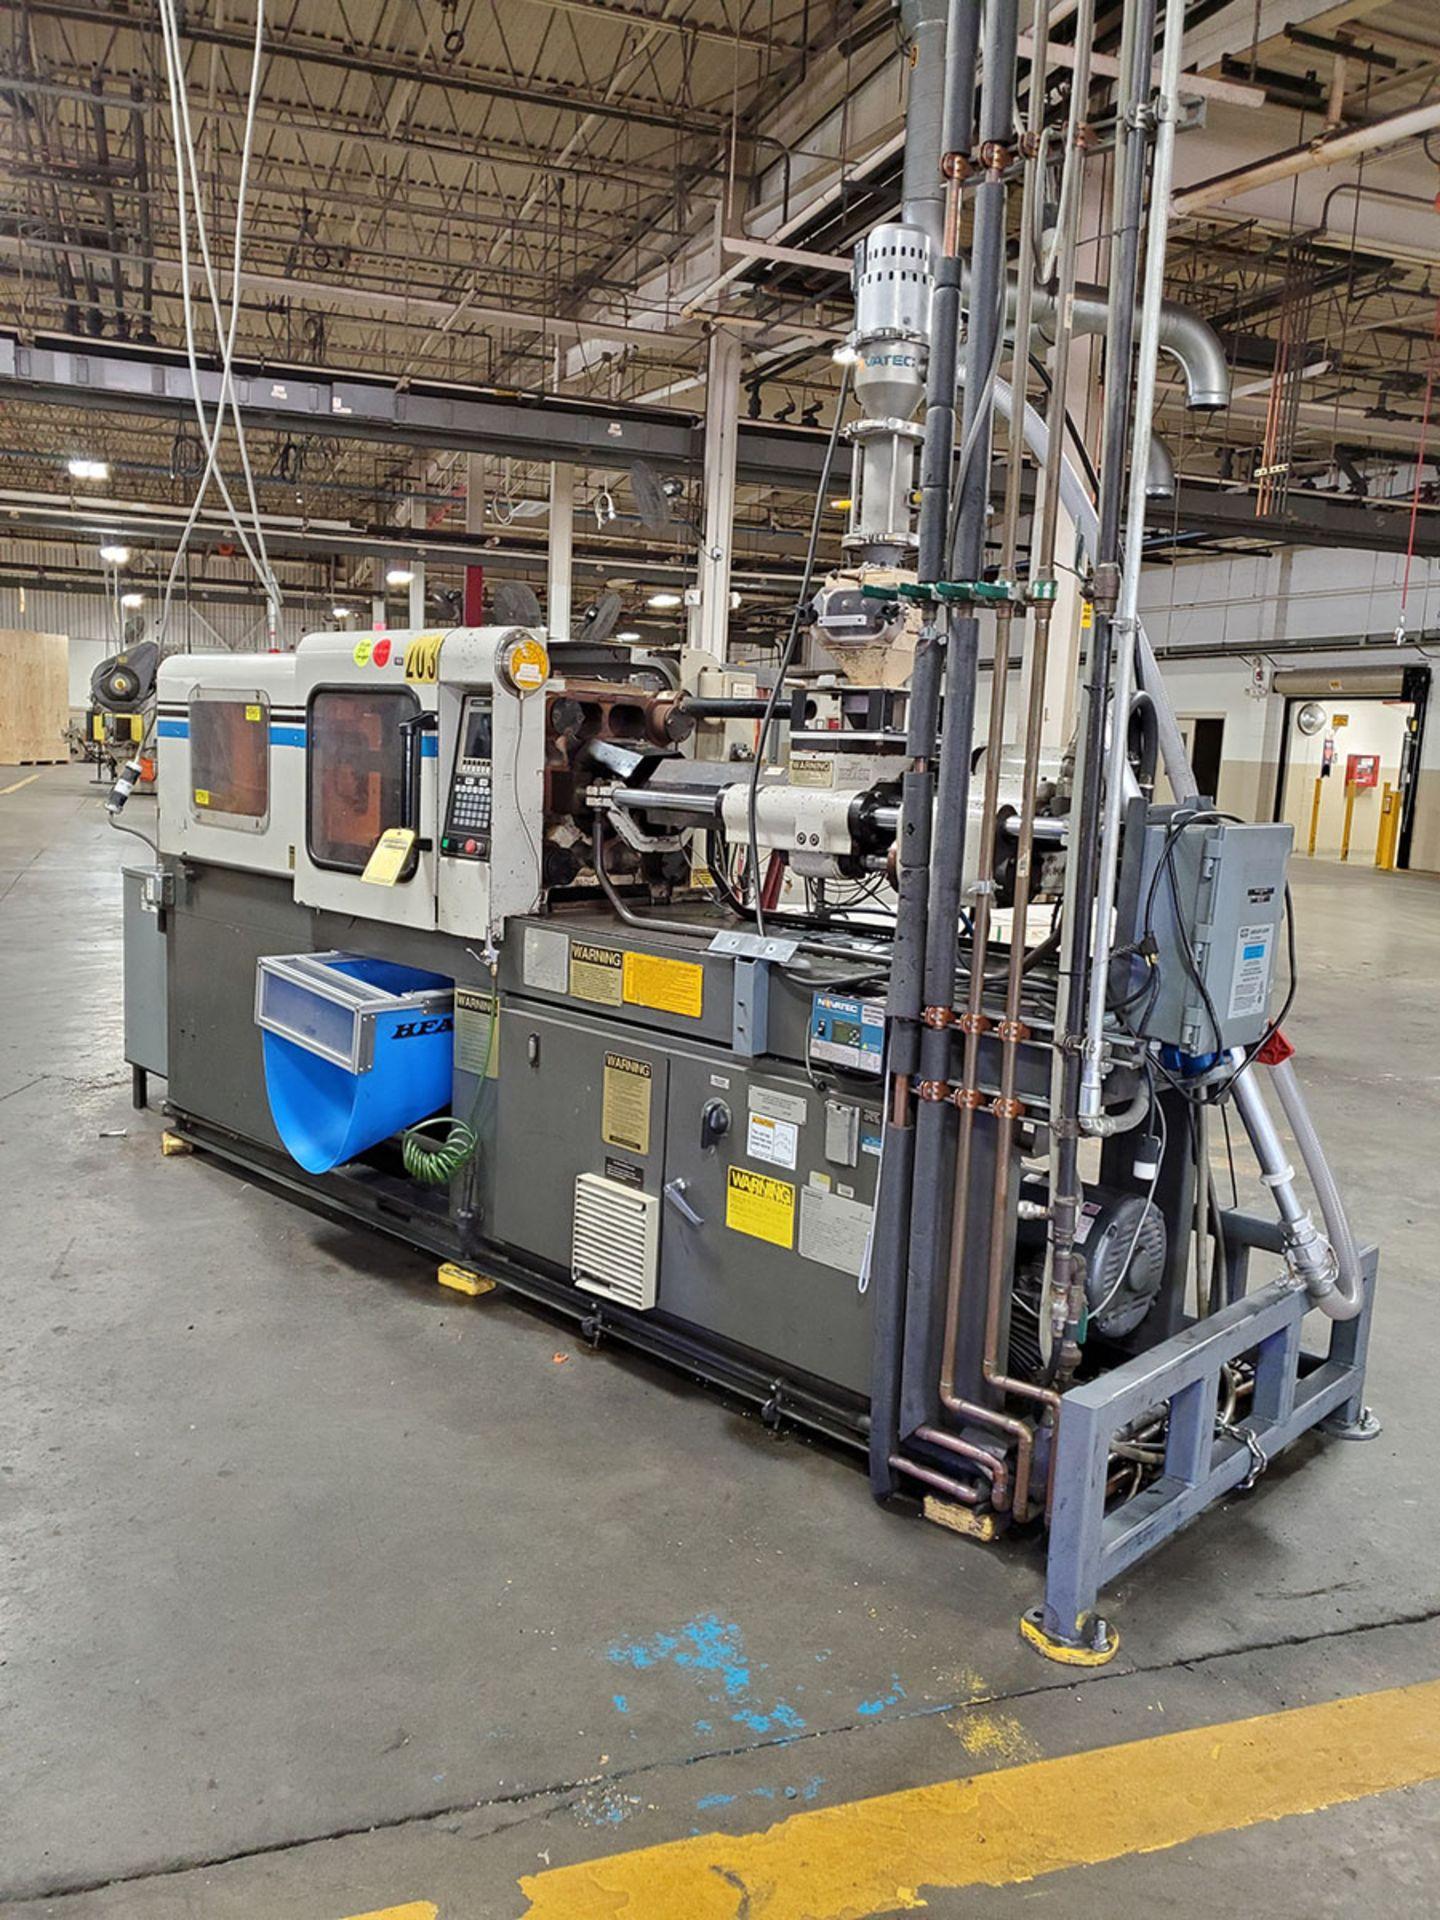 Lot 170 - 1995 CINCINNATI MILACRON 55-TON PLASTIC INJECTION MOLDING MACHINE; MODEL VSX-55-2-97, S/N